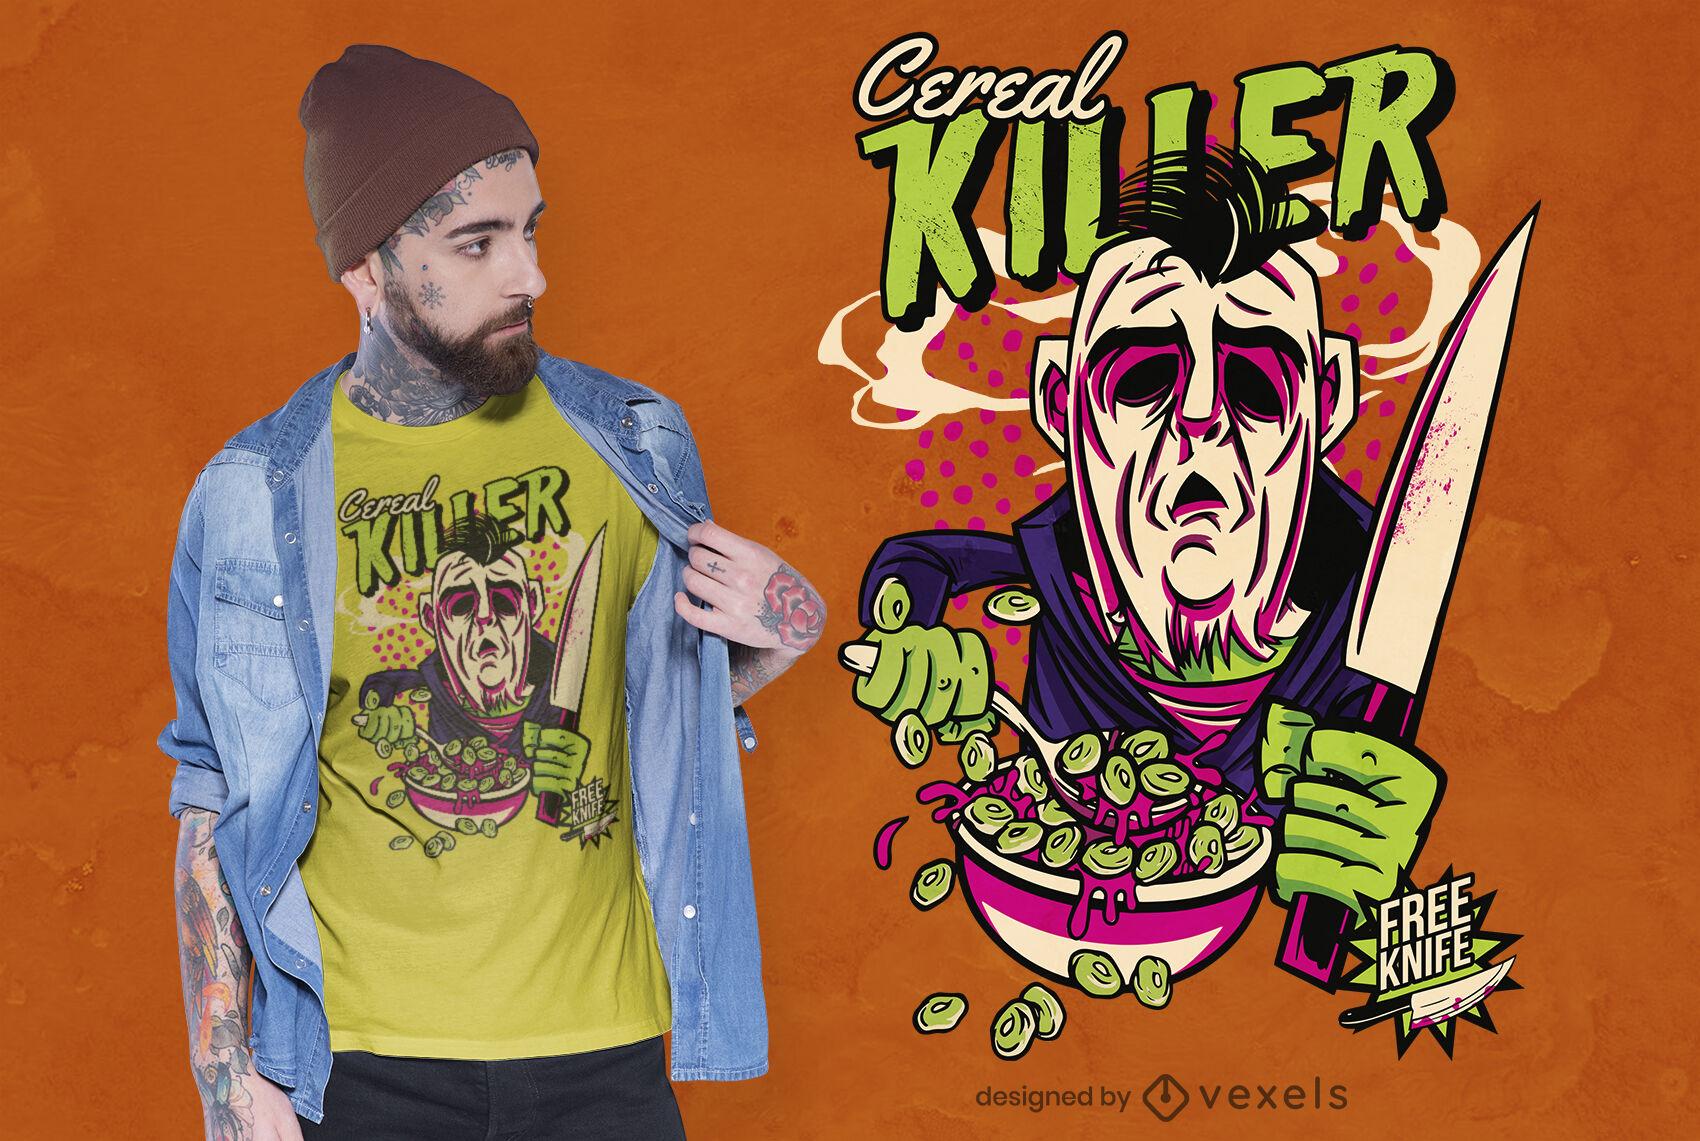 Serial killer cereal pun t-shirt design